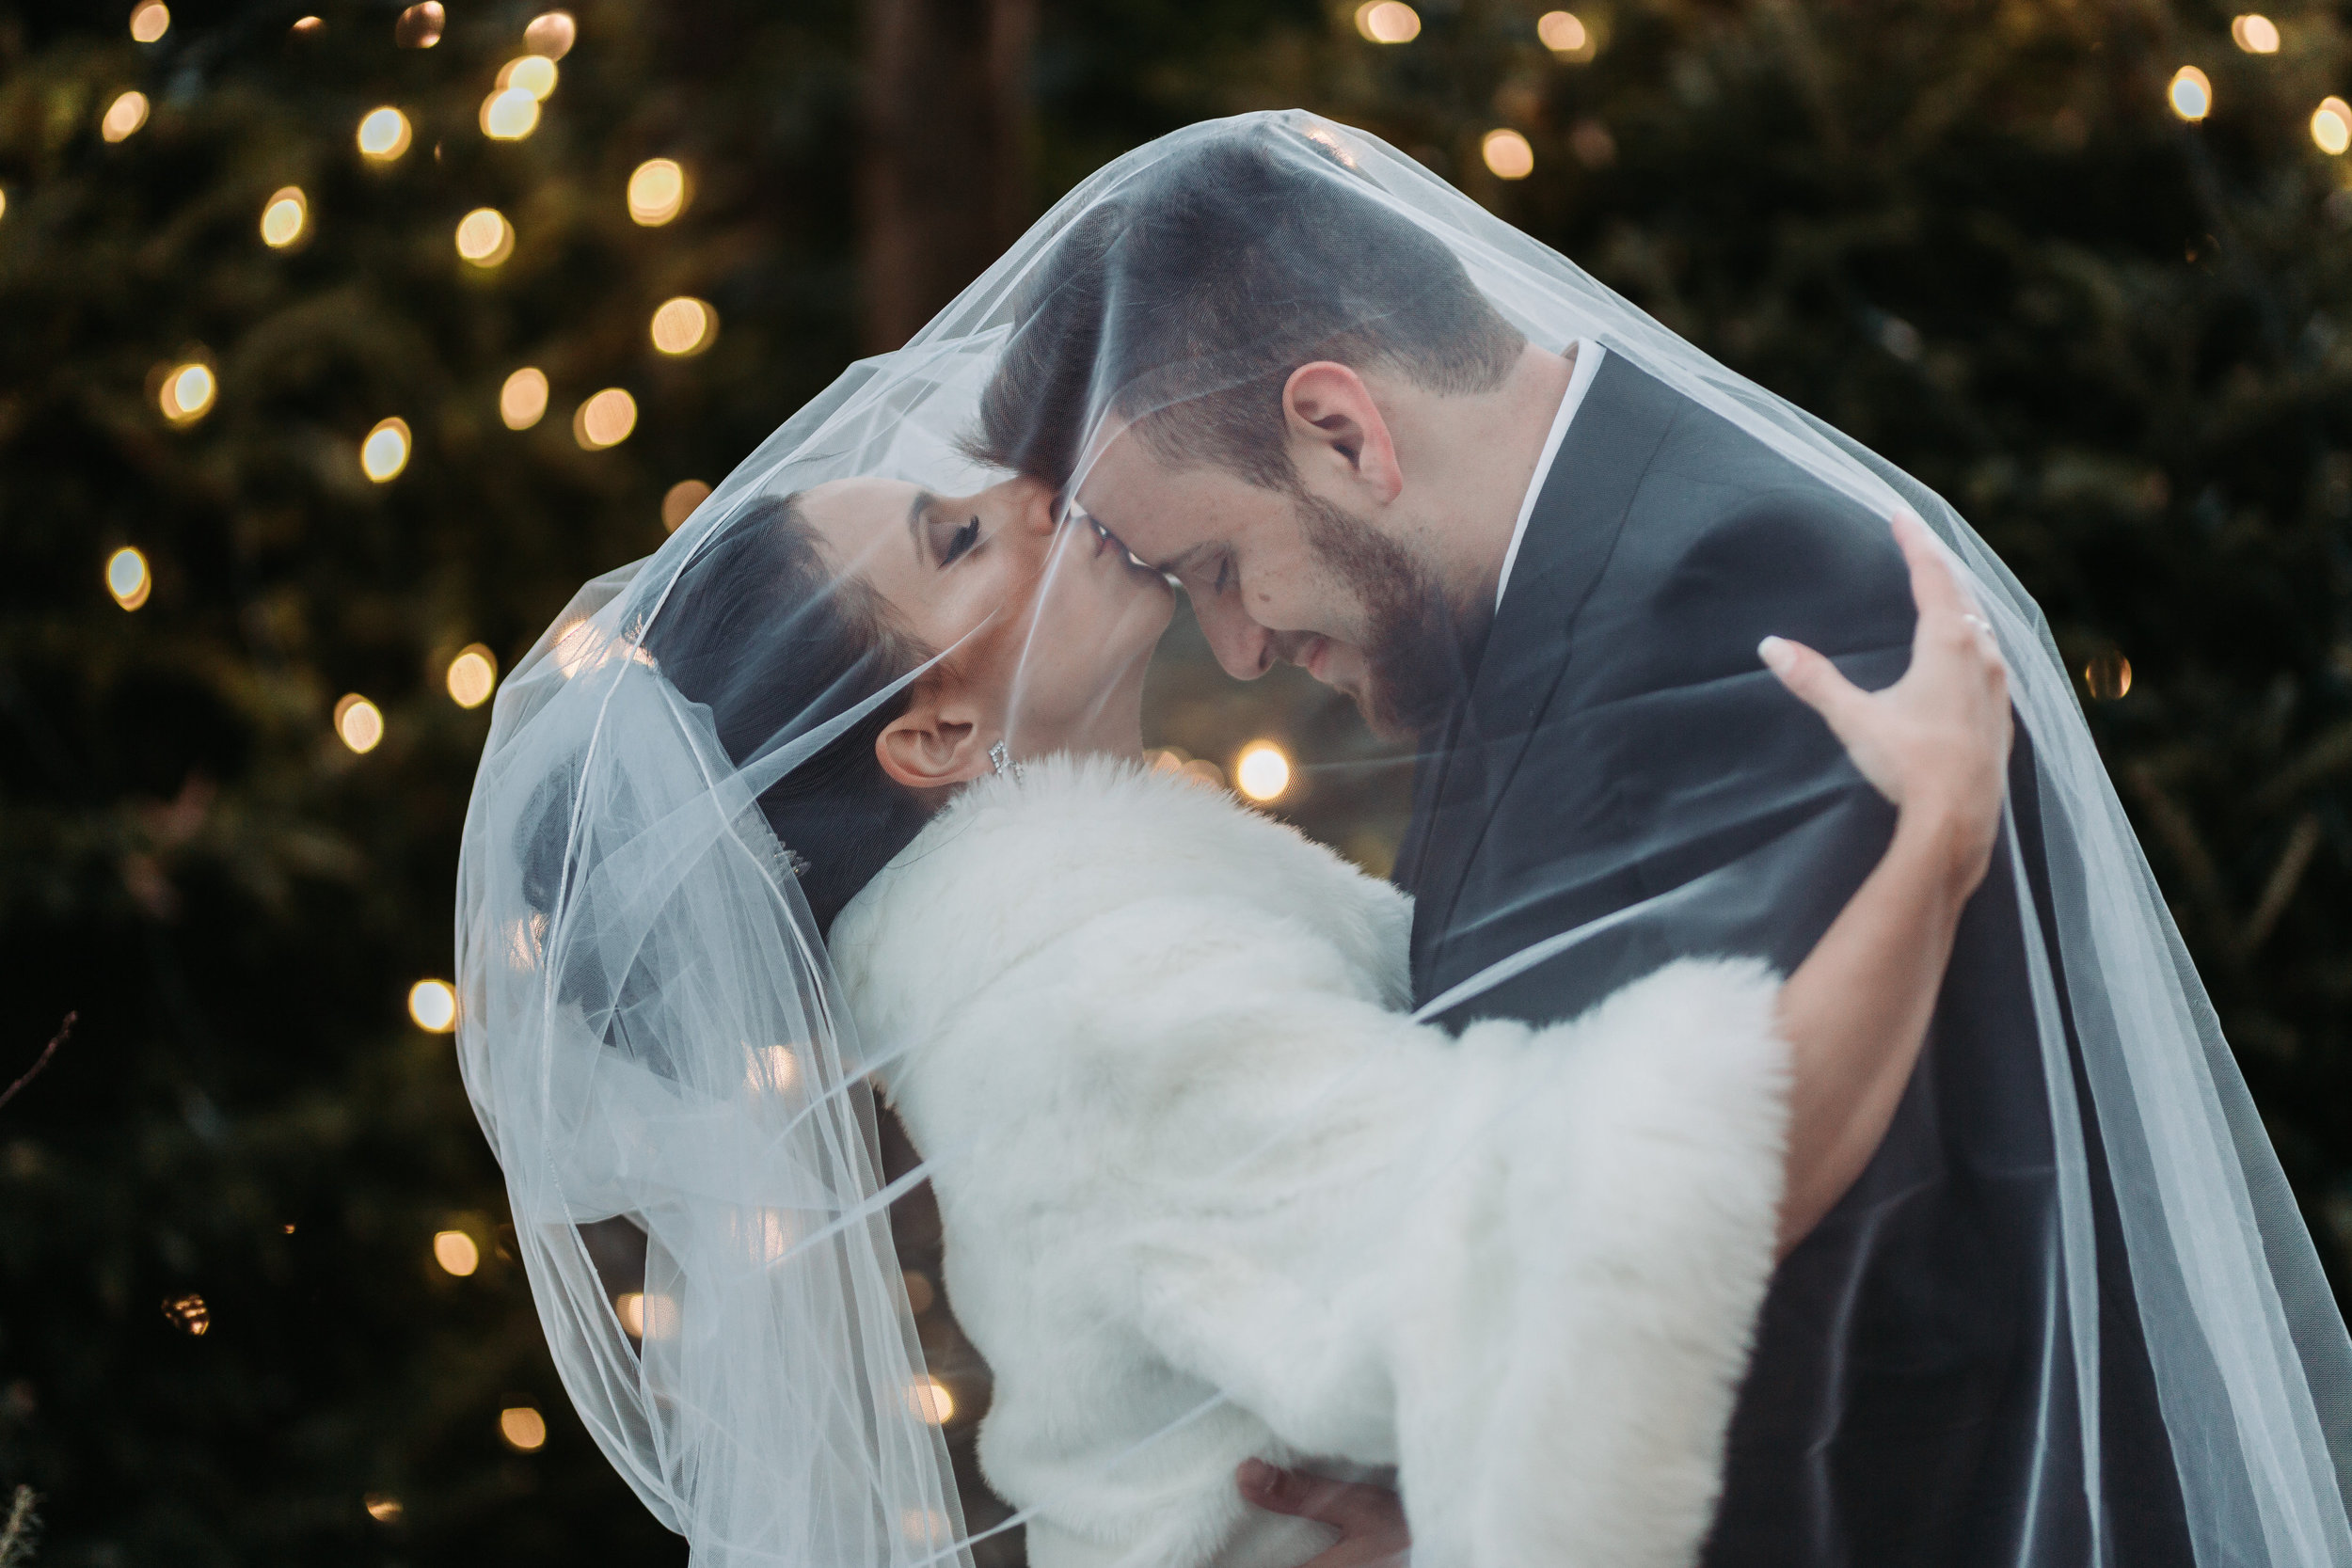 Carina Loss e Thiago Casamento Gabriel-Carina Loss e Thiago Casamento -0254.jpg